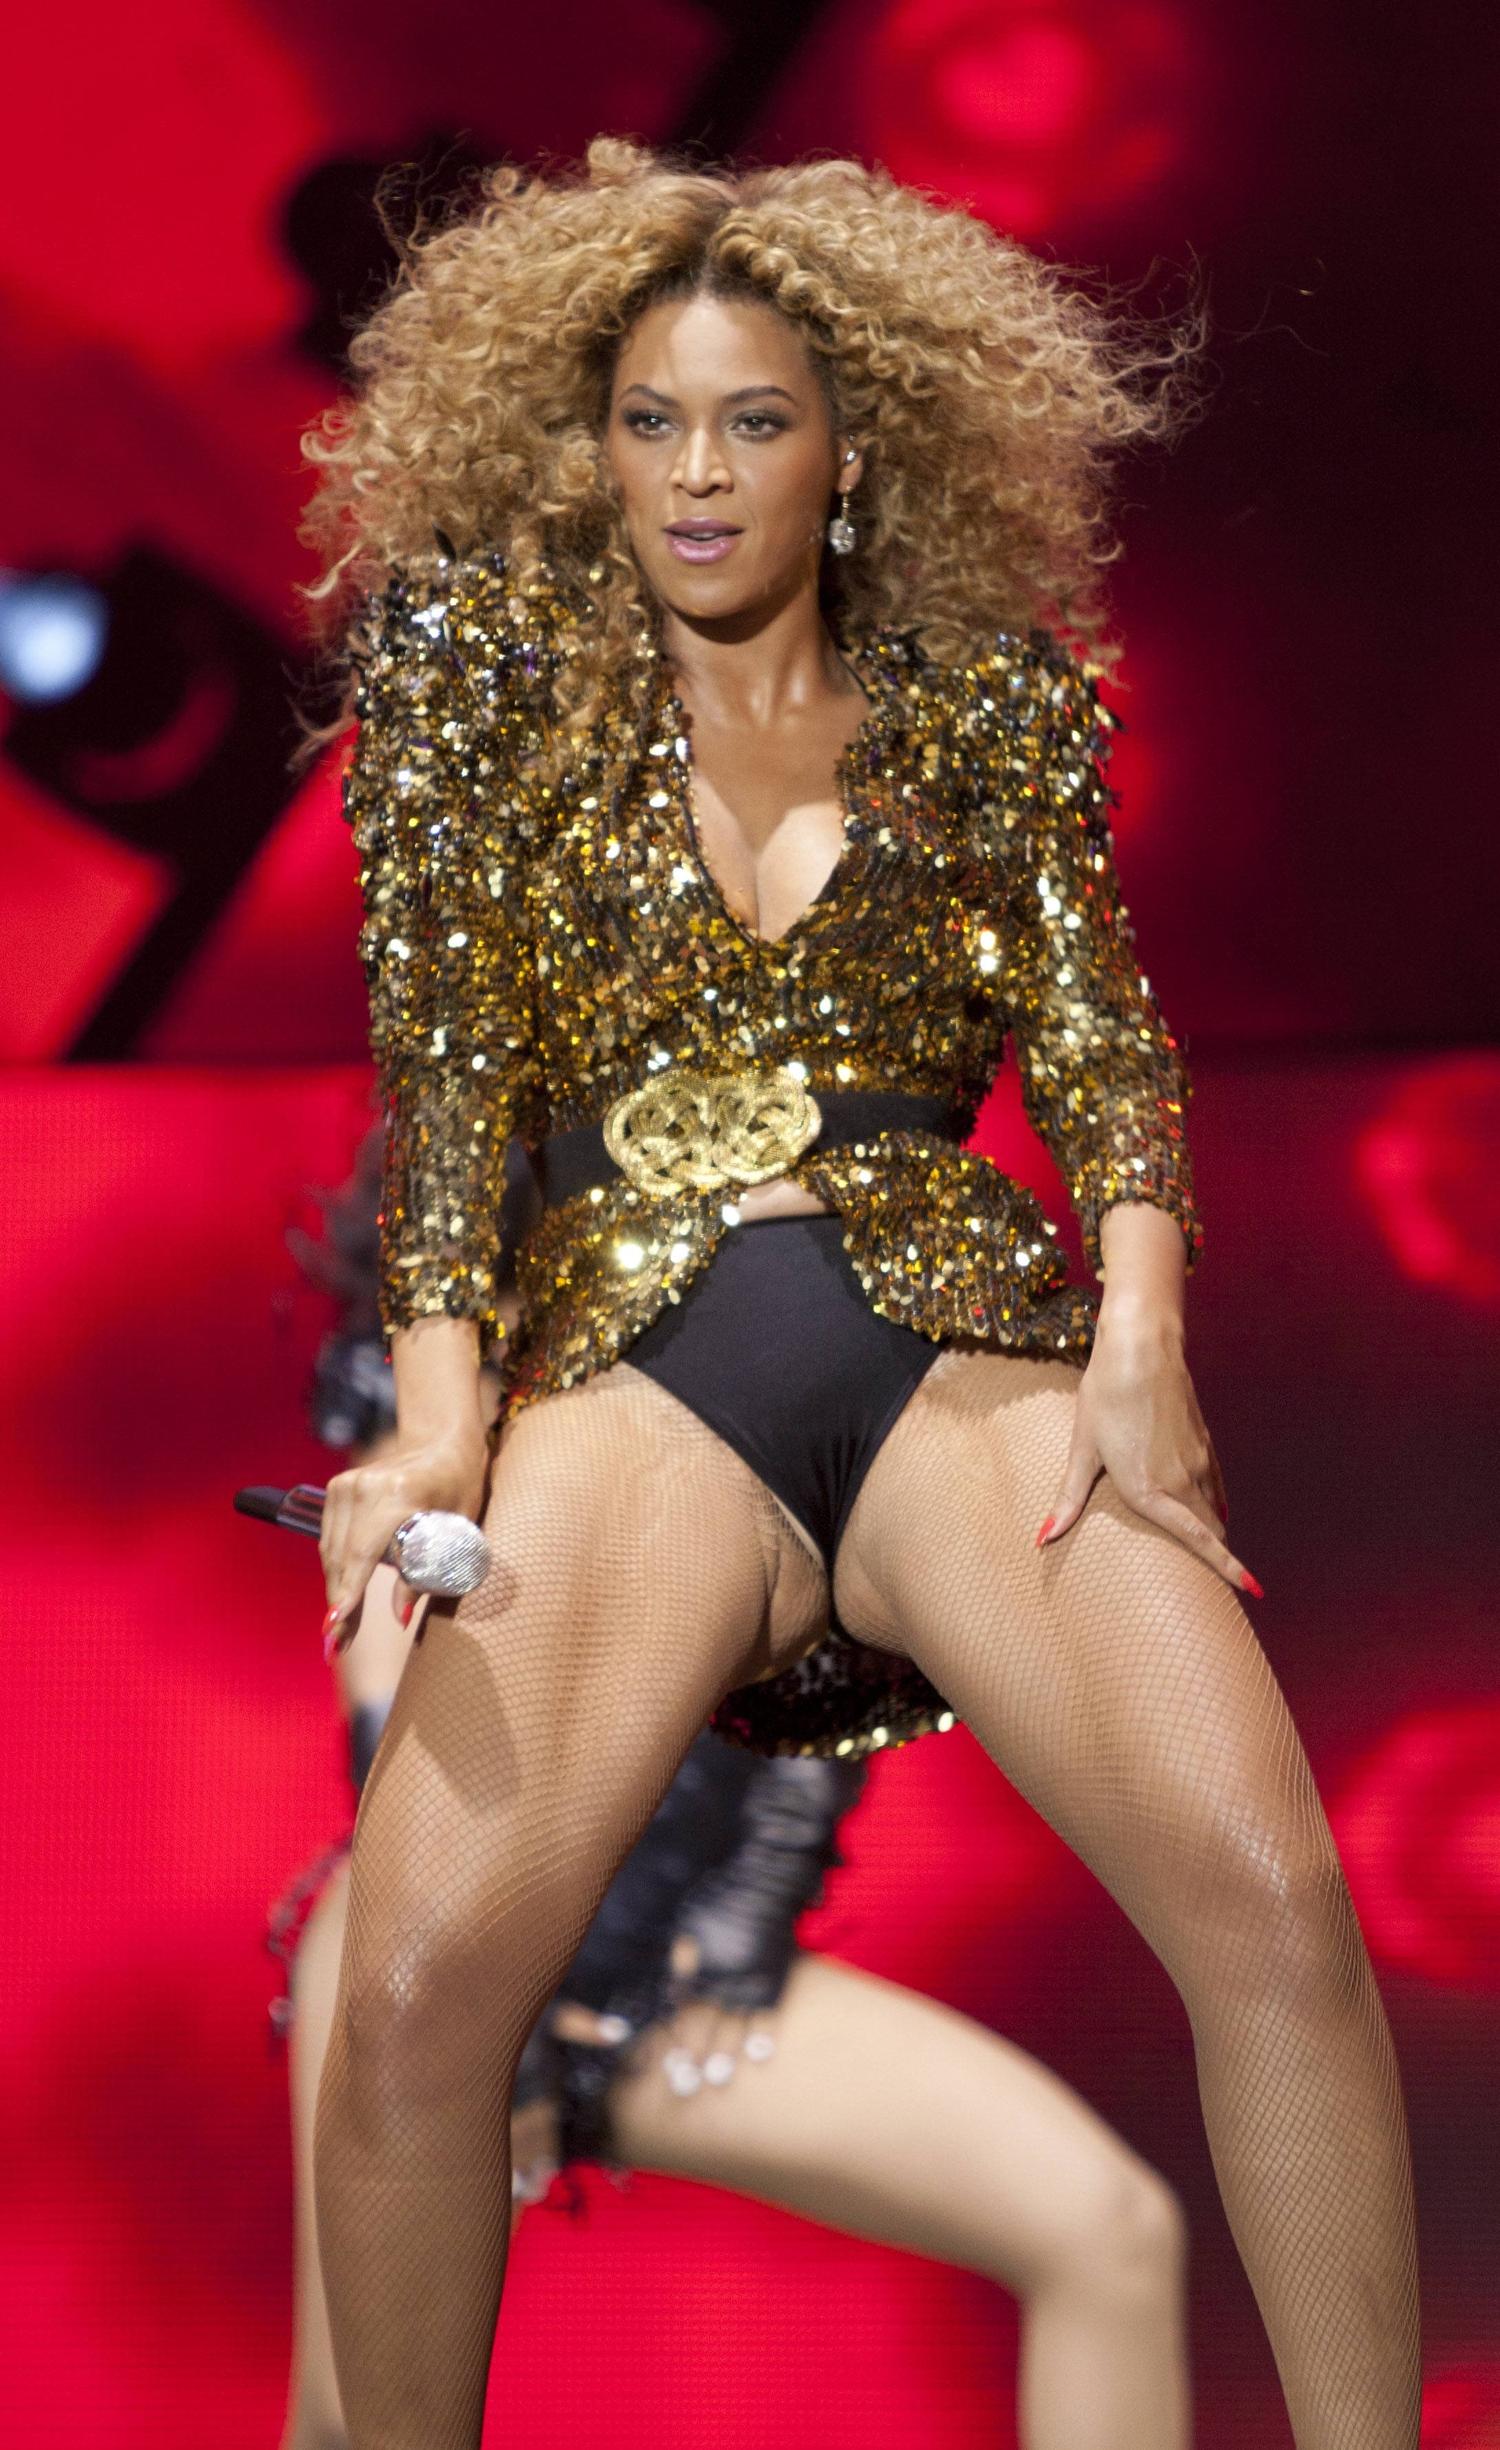 Beyonce isn't aging well